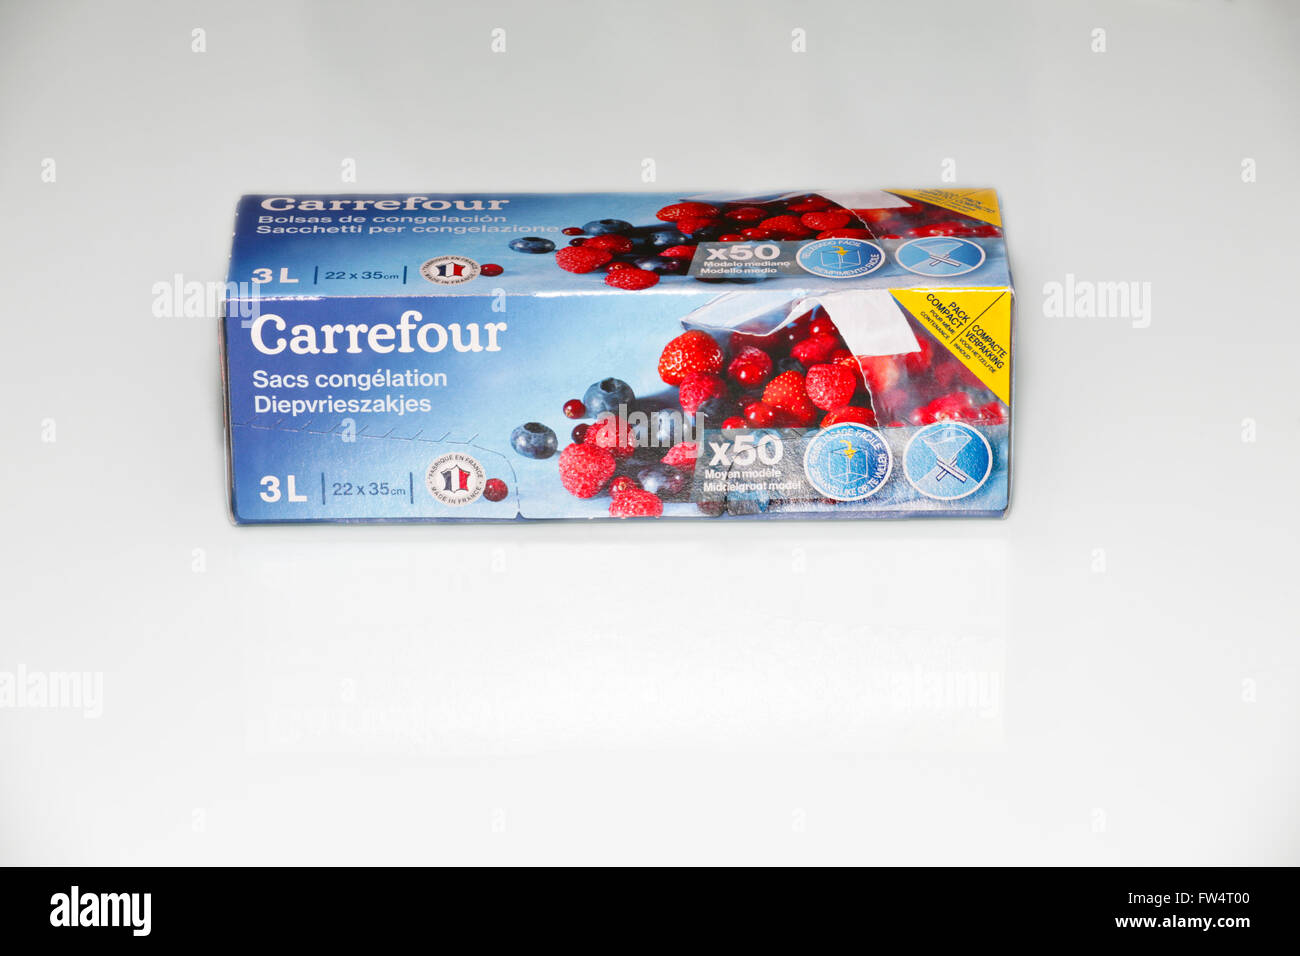 box of carrefour plastic freezer bags